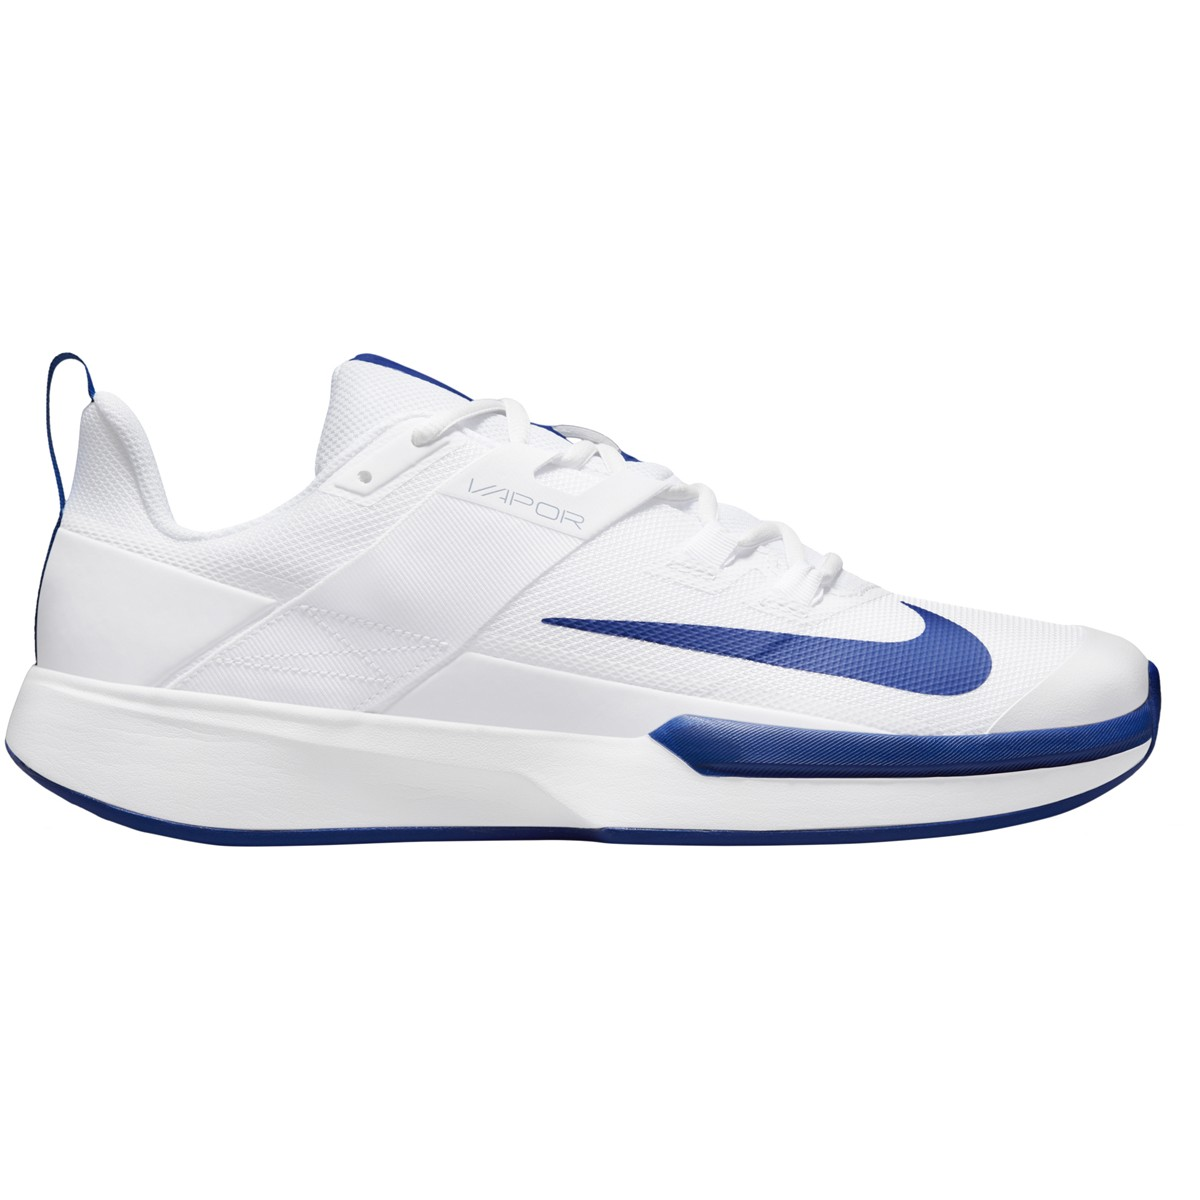 Chaussures Nike Vapor Lite Toutes Surfaces - Chaussures tennis ...